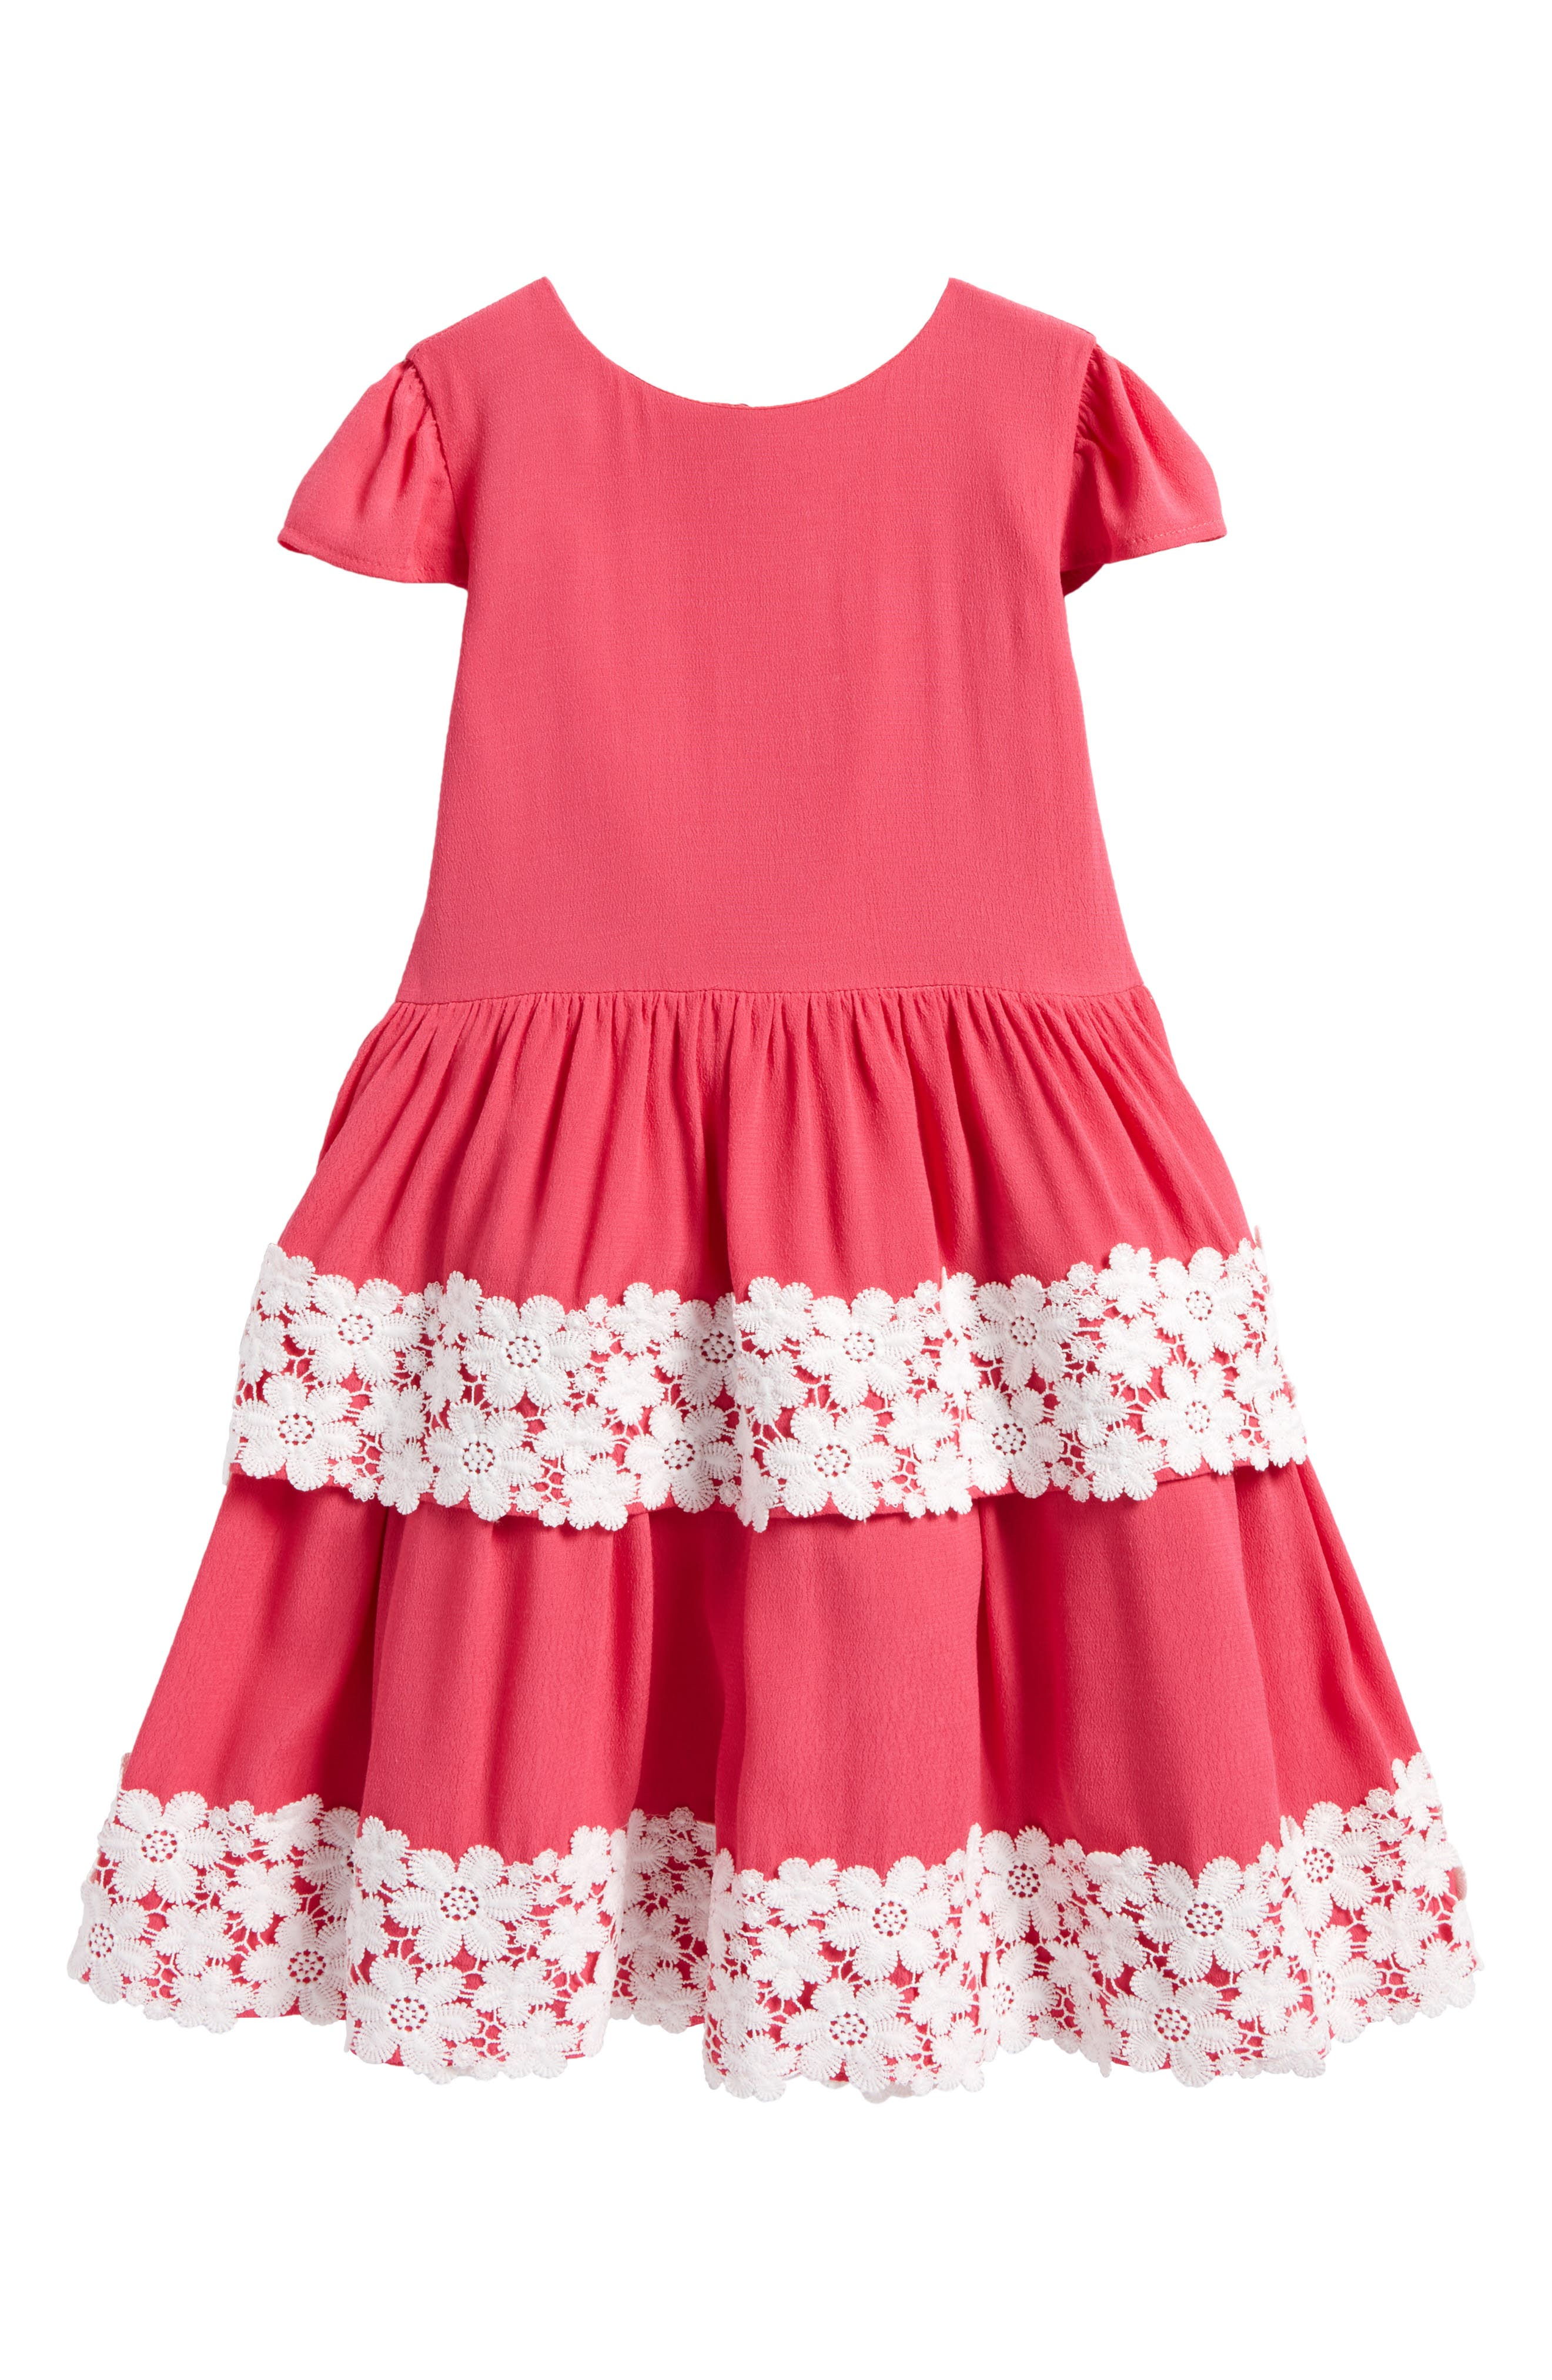 Tiered Skirt Dress,                             Main thumbnail 1, color,                             Calypso Coral